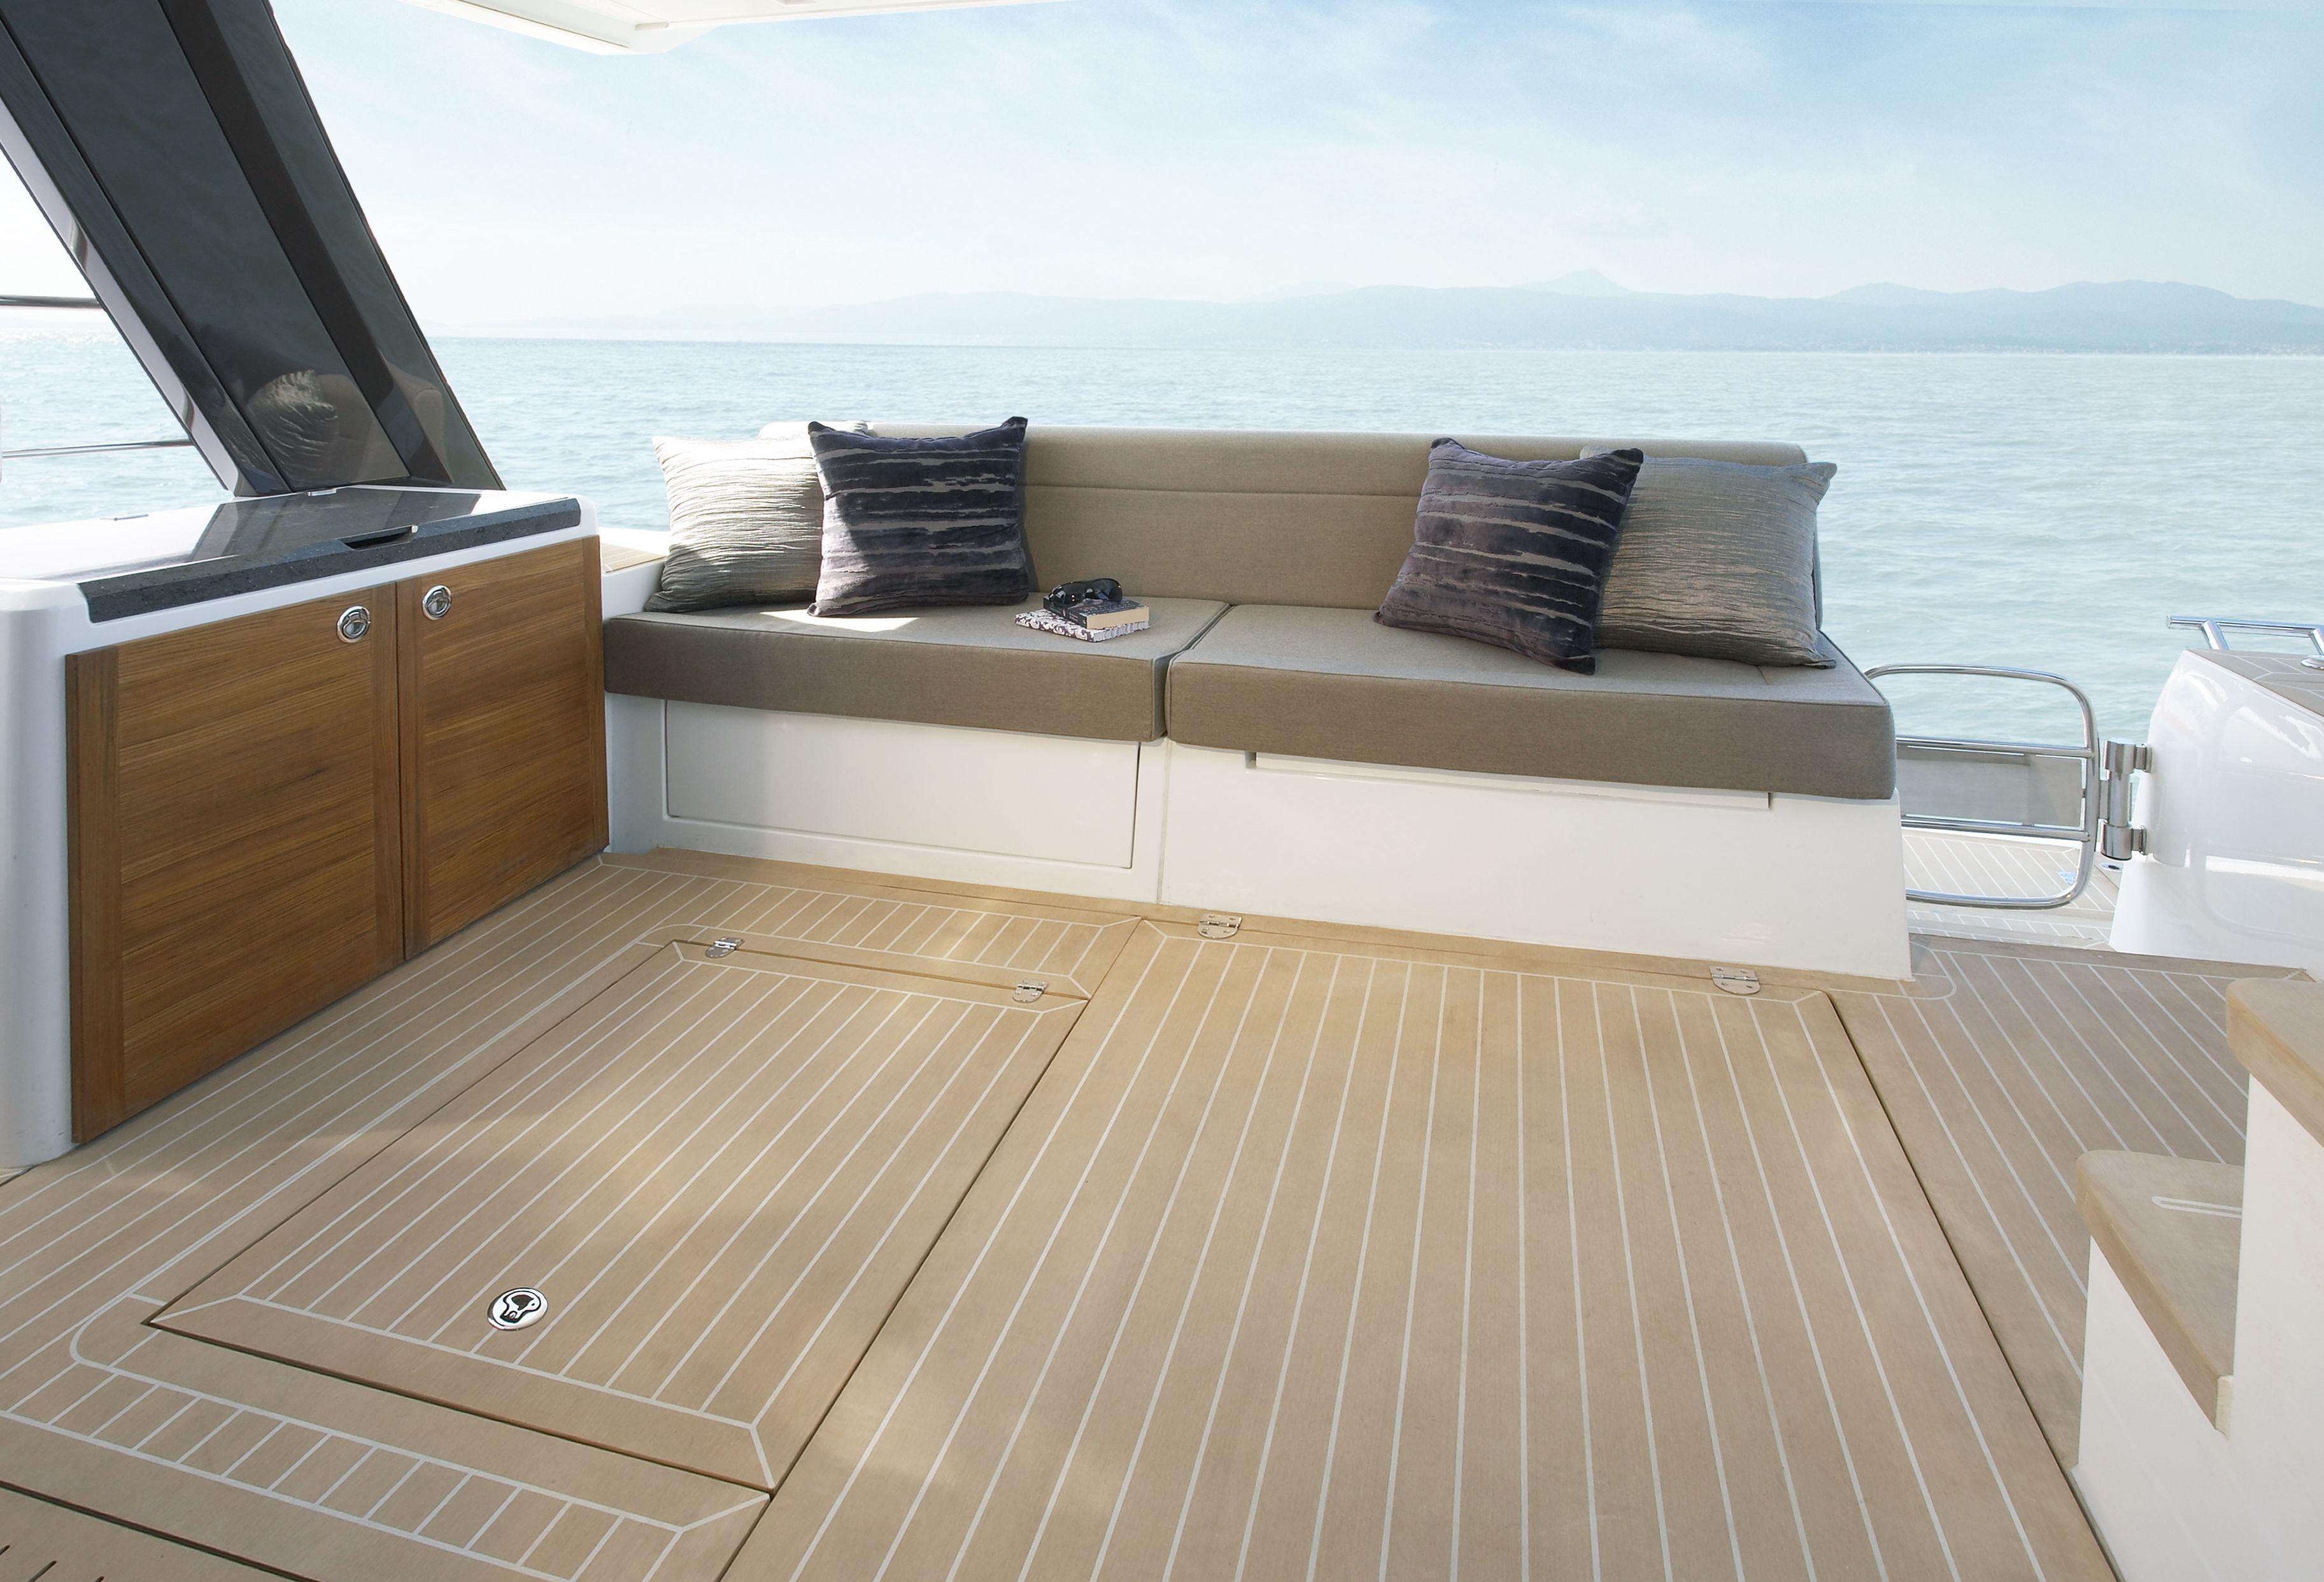 Synthetic Boat Floor Material Marine Boat Flooring